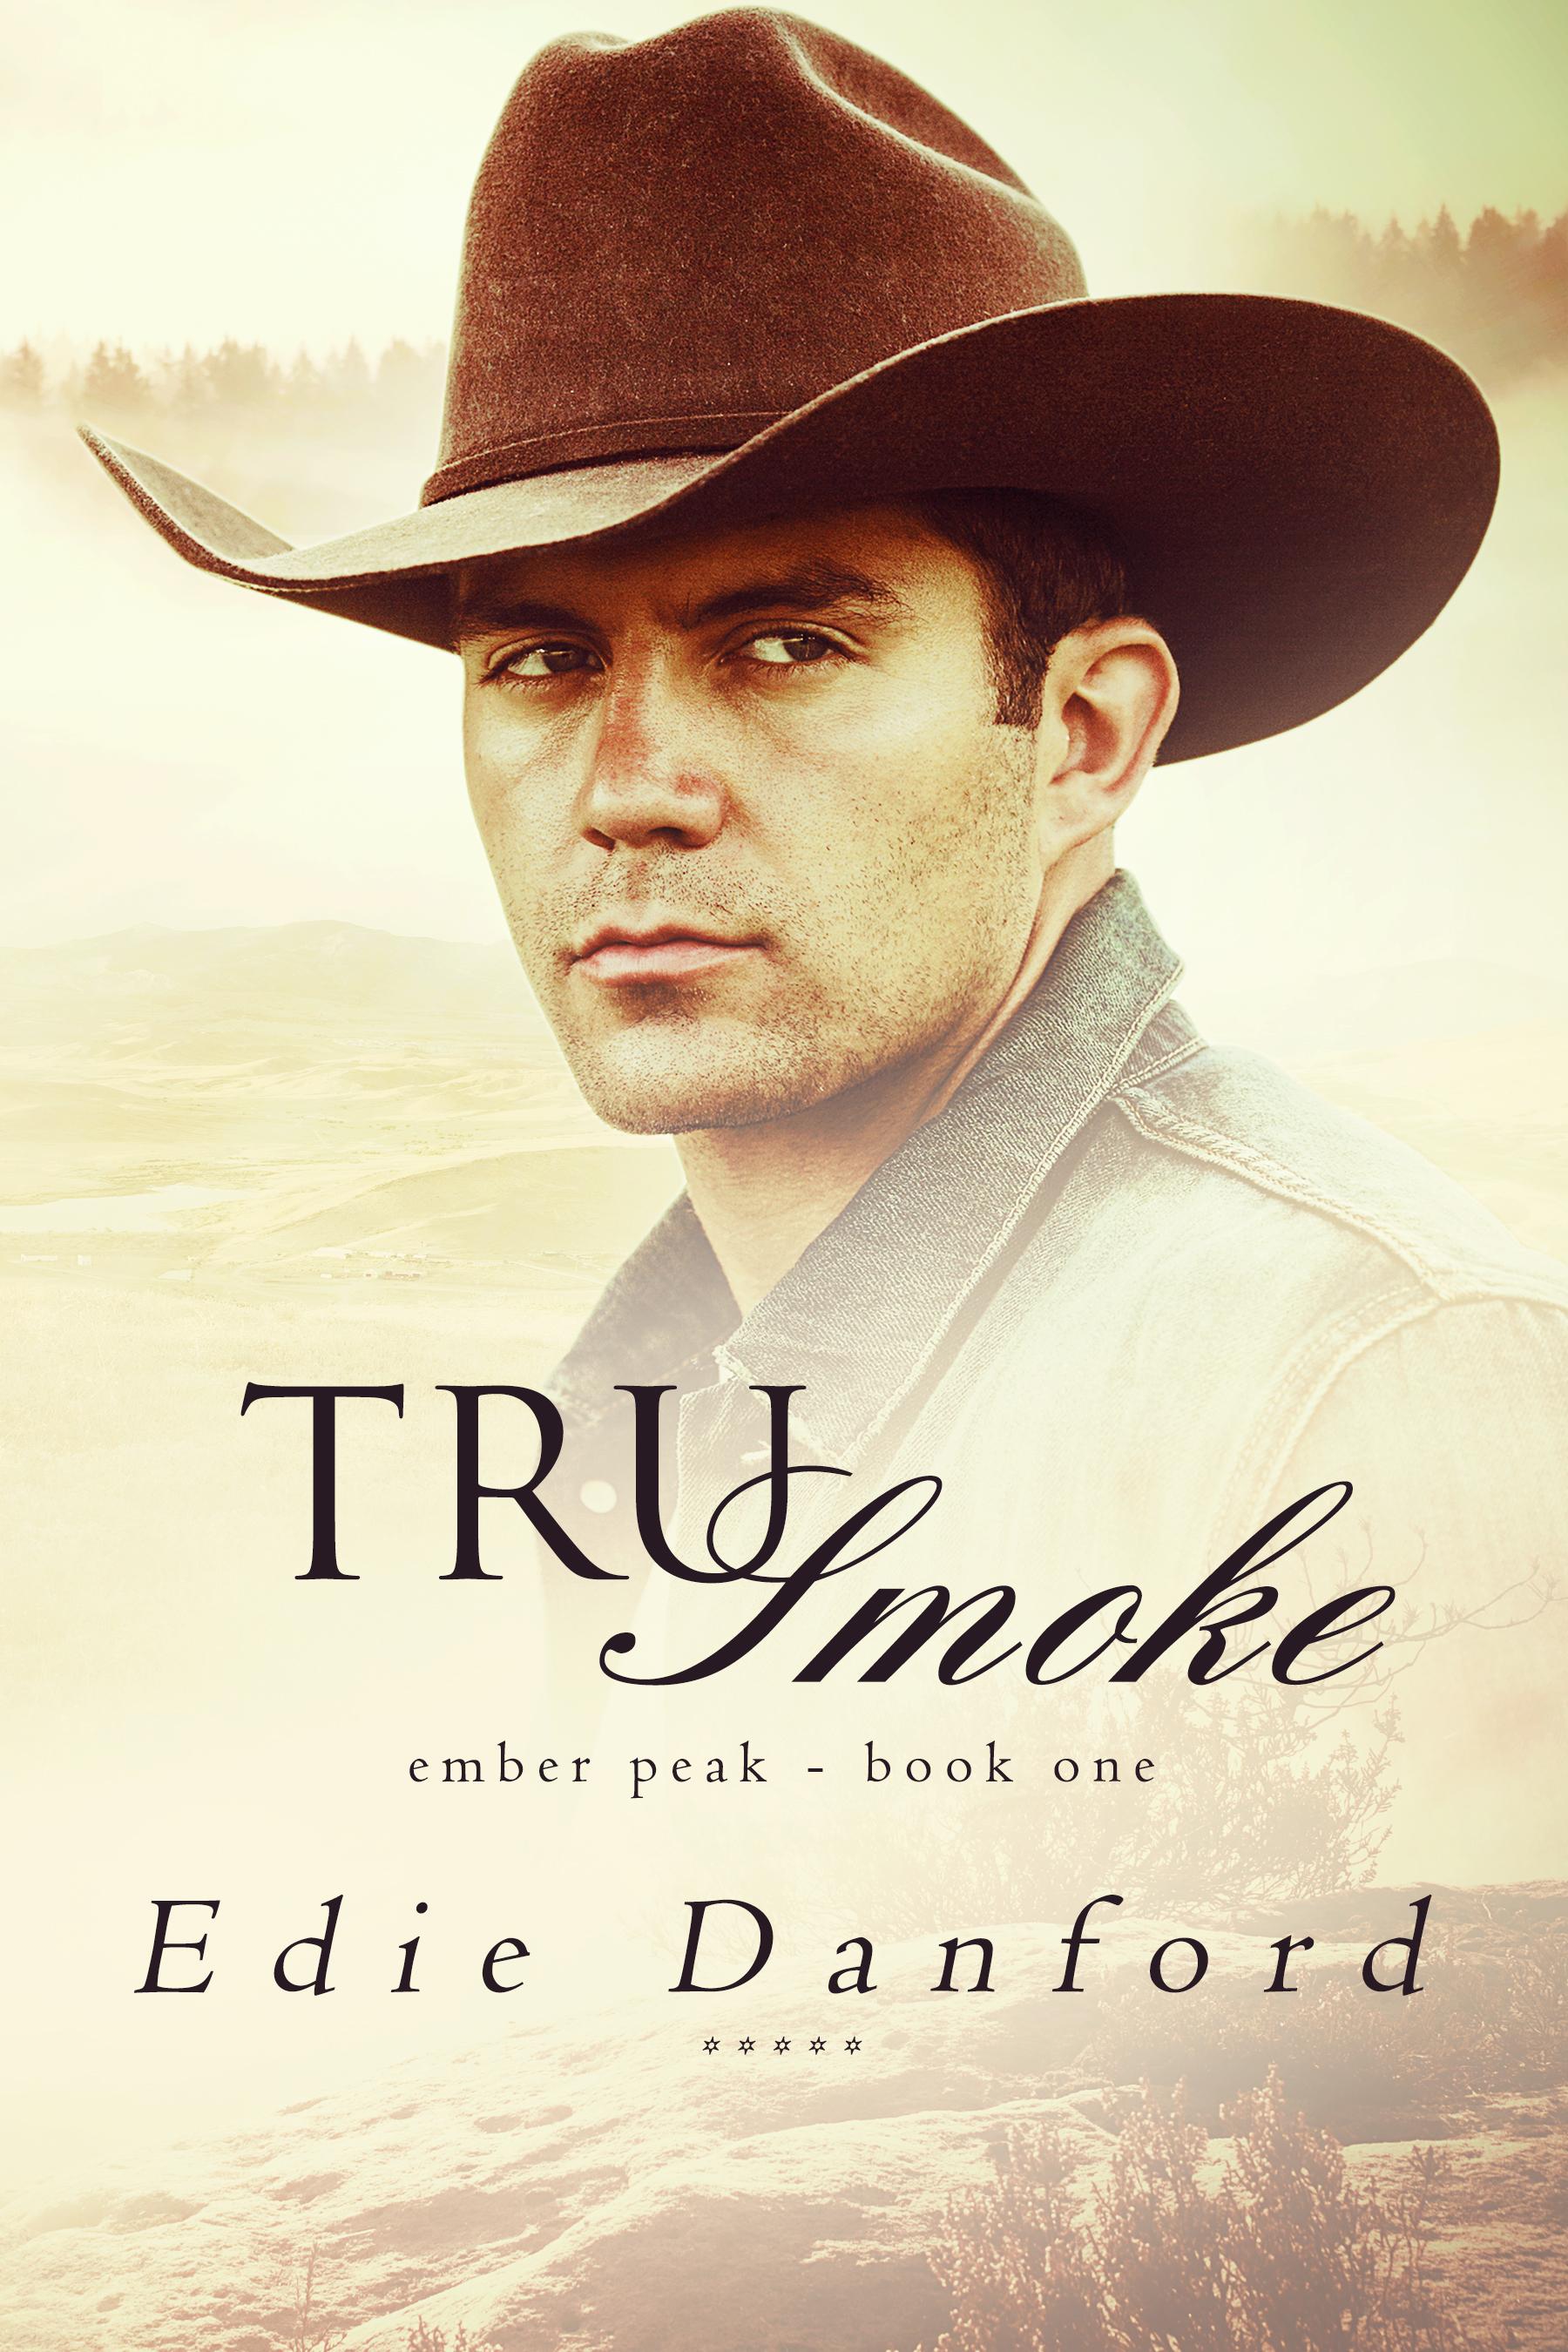 Guest Post and Giveaway: Tru Smoke by Edie Danford